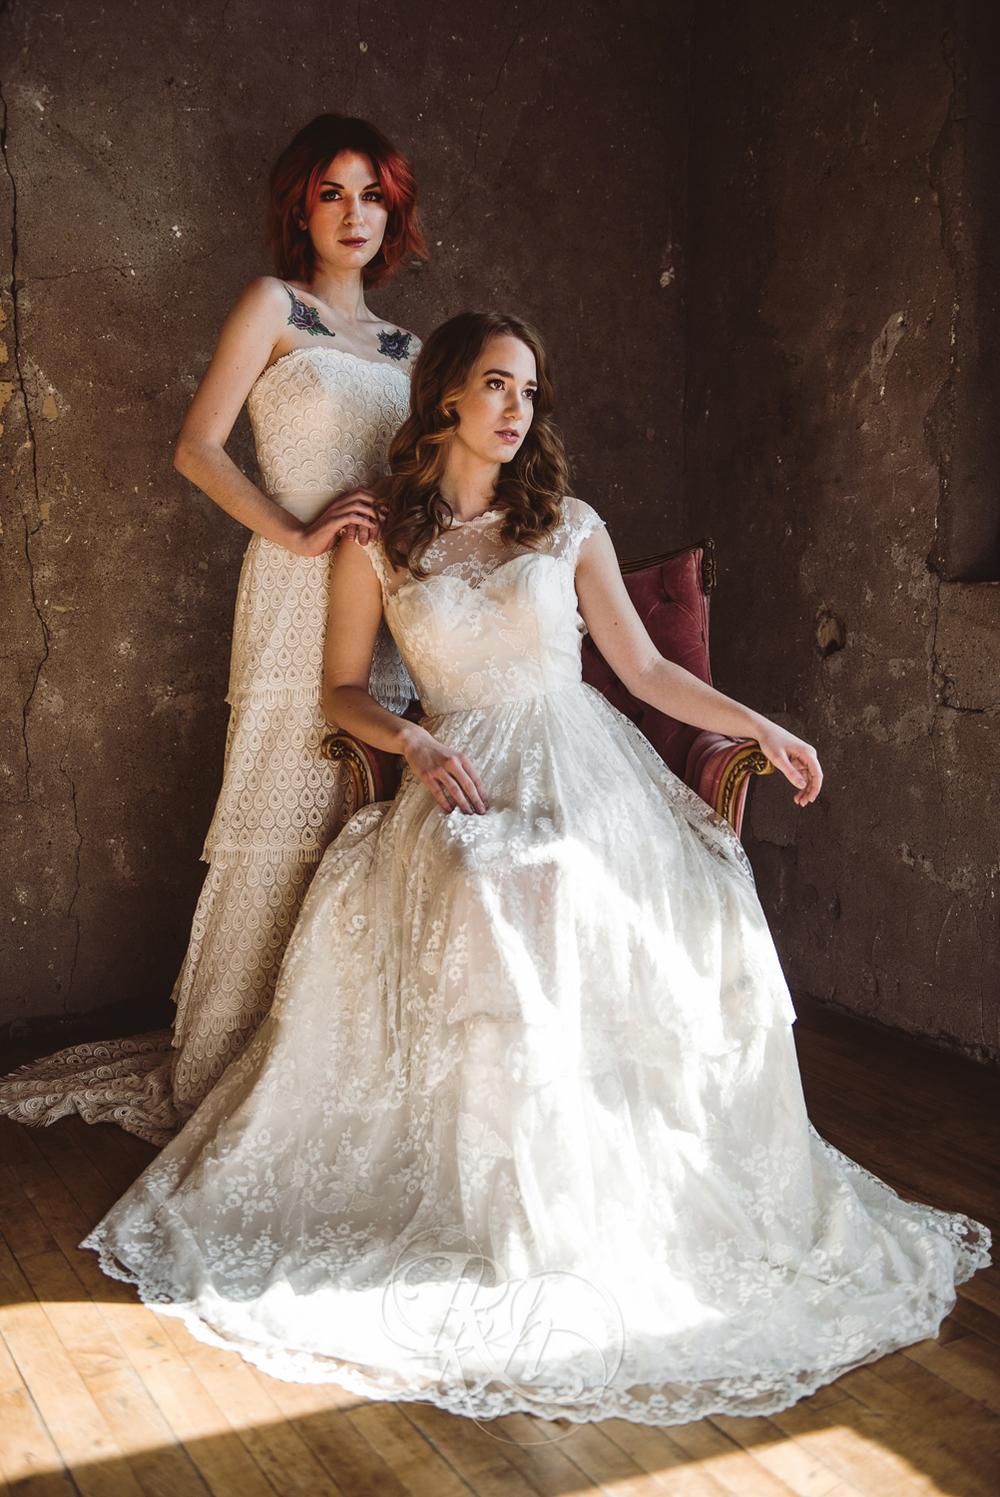 Minneapolis Wedding Shoot - RKH Images - Minnesota Wedding Photographer - Samples-16